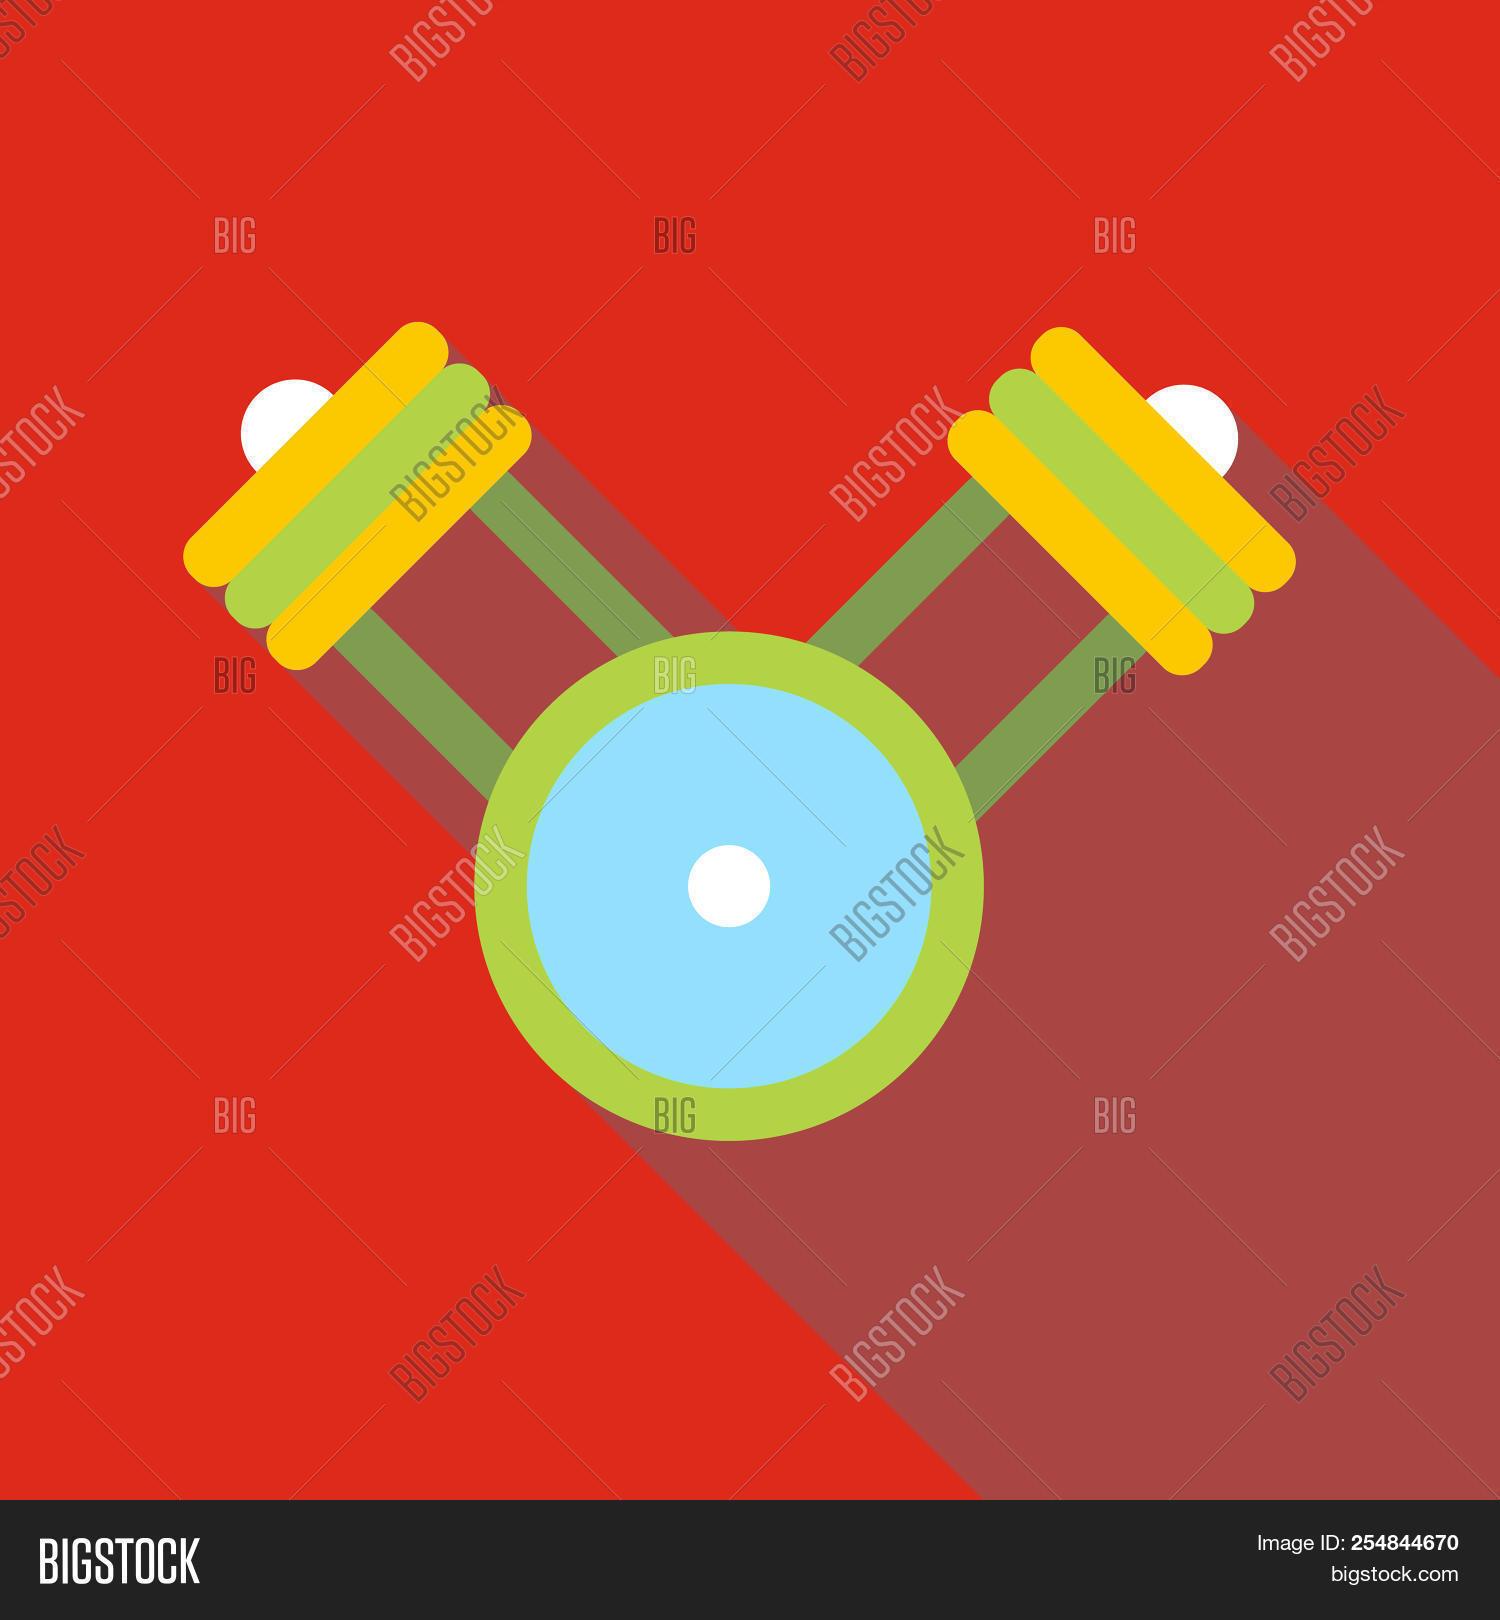 Engine Pistons On A Crankshaft Icon. Flat Illustration Of Engine Pistons On  A Crankshaft Icon